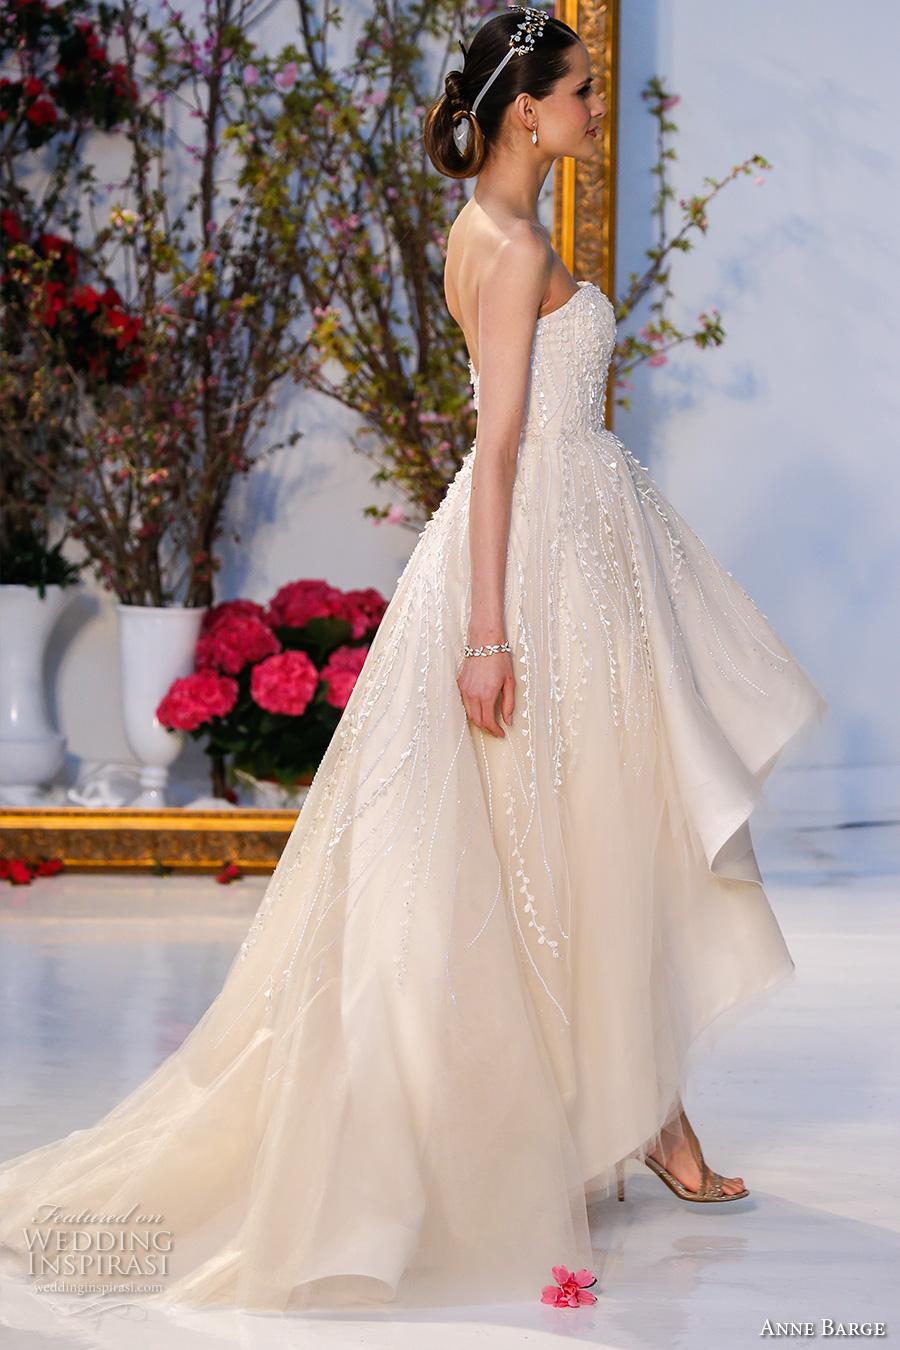 Anne barge spring 2017 wedding dresses wedding inspirasi for High low sweetheart wedding dress